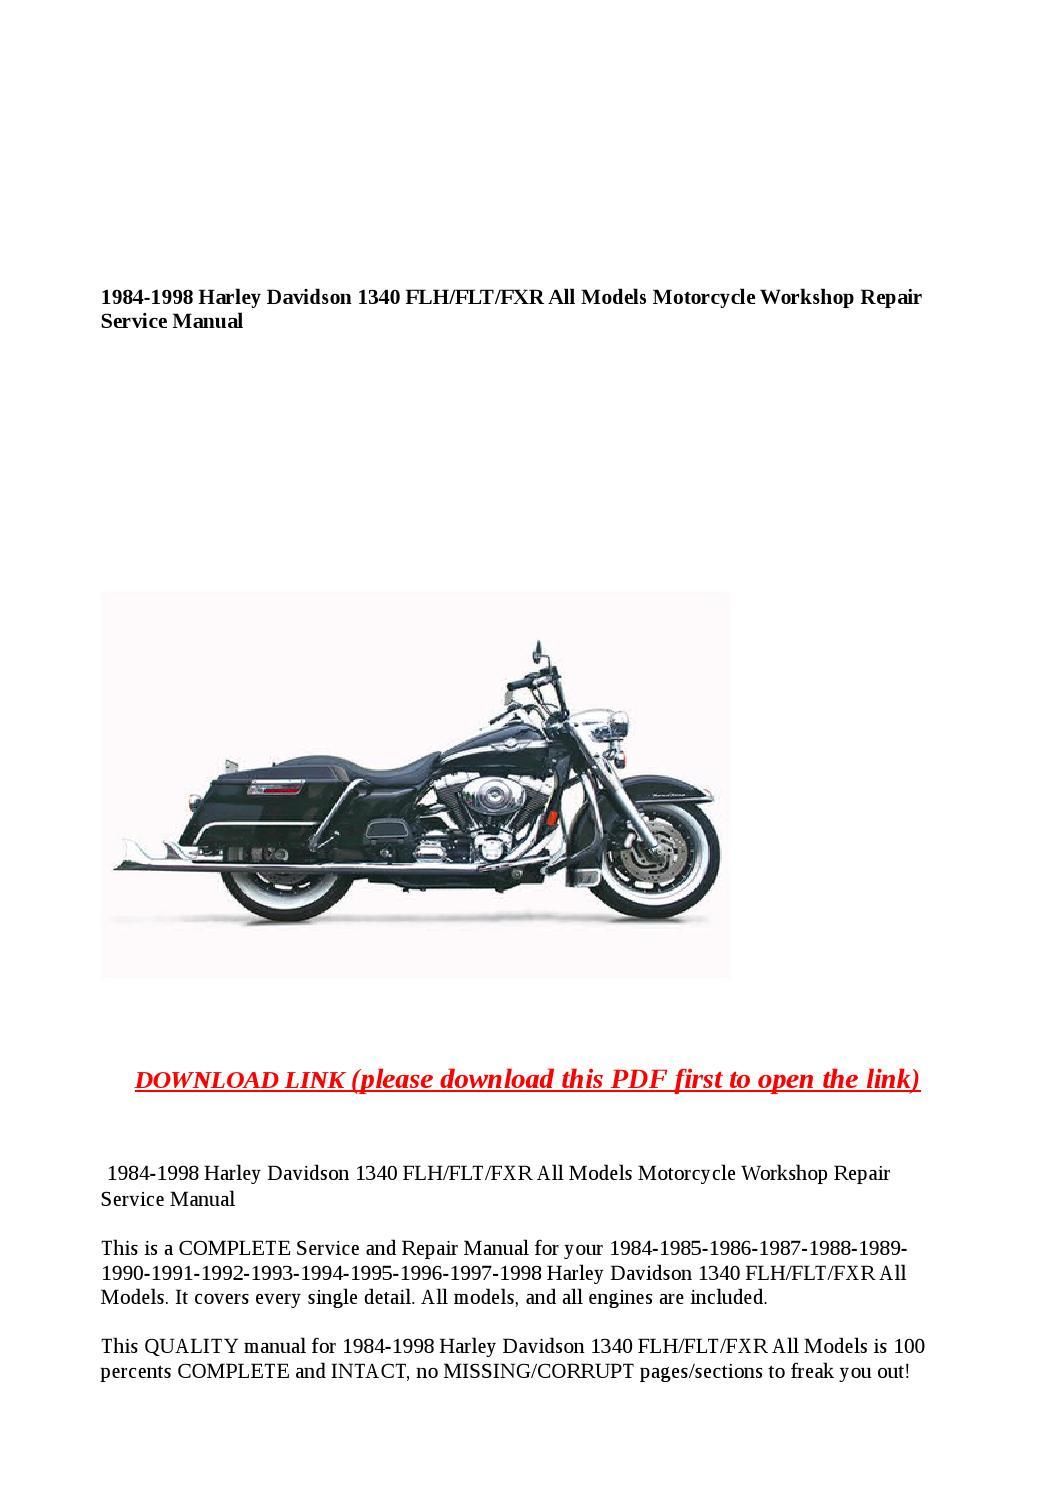 1986 harley sportster wiring diagram 2016 craftsman lt2000 davidson fxr for 1990 best library 1984 1998 1340 flh flt all models motorcycle rh issuu com softail